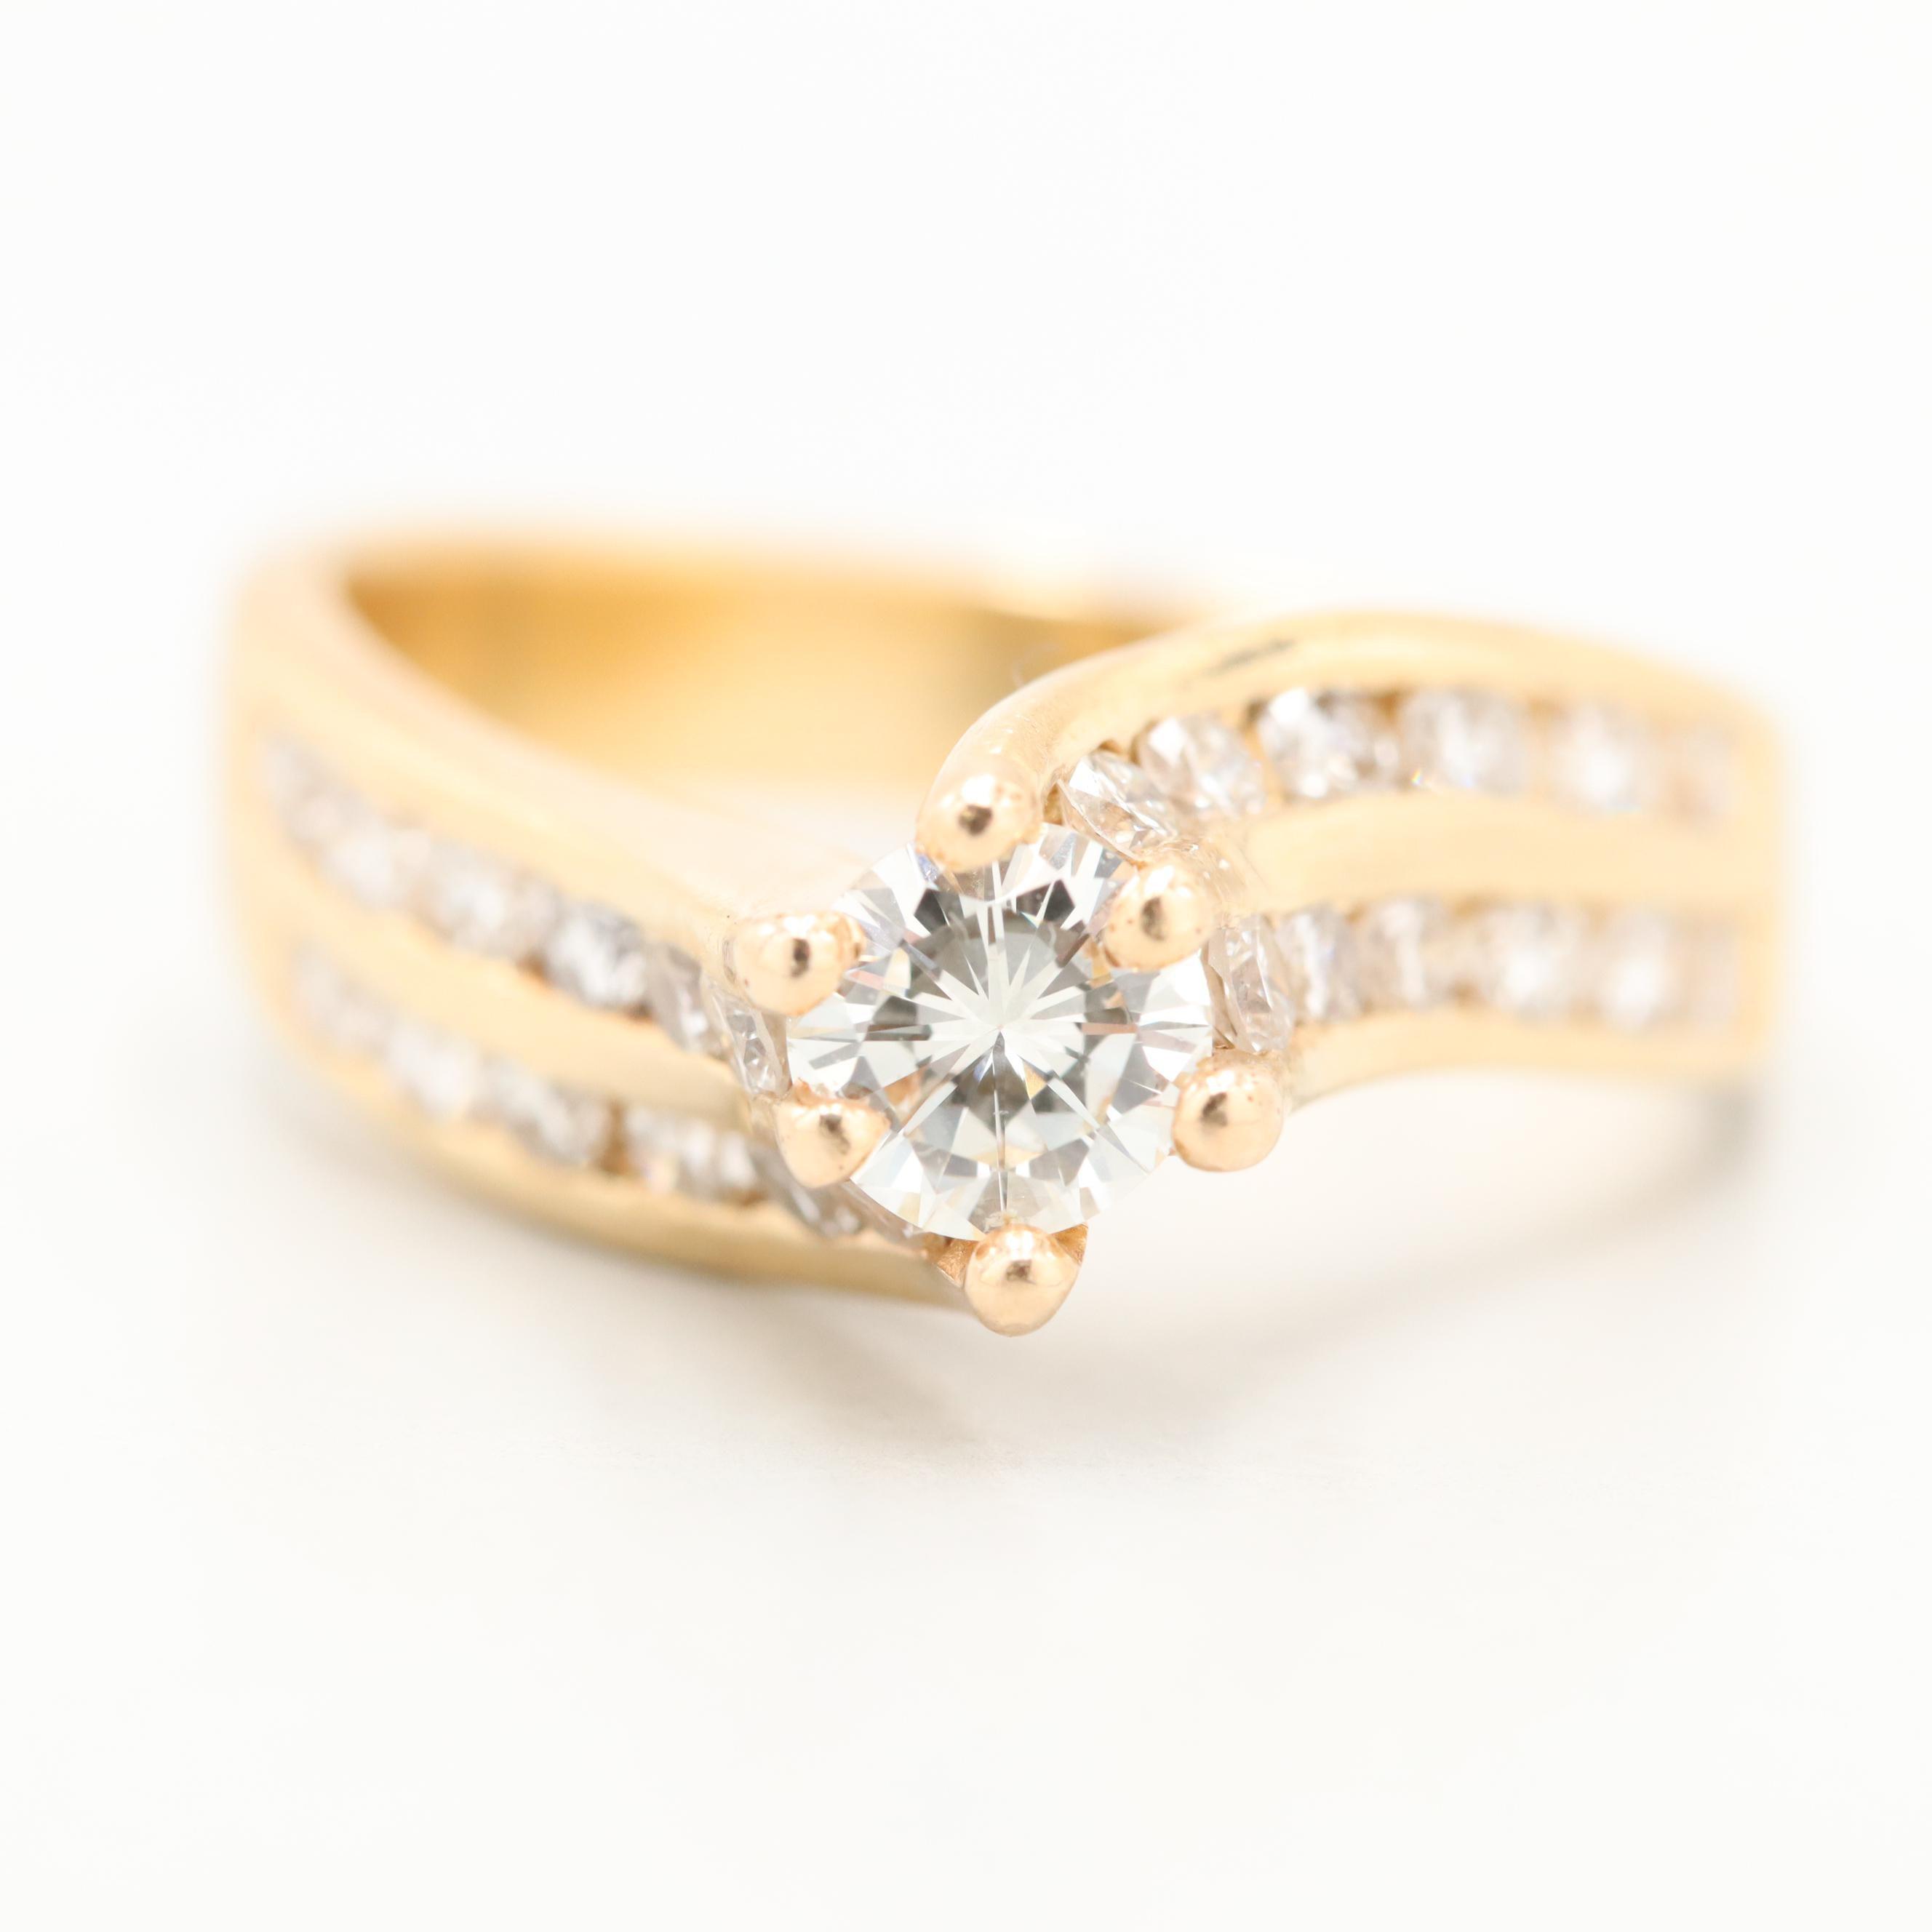 14K Yellow Gold 1.06 CTW Diamond Ring